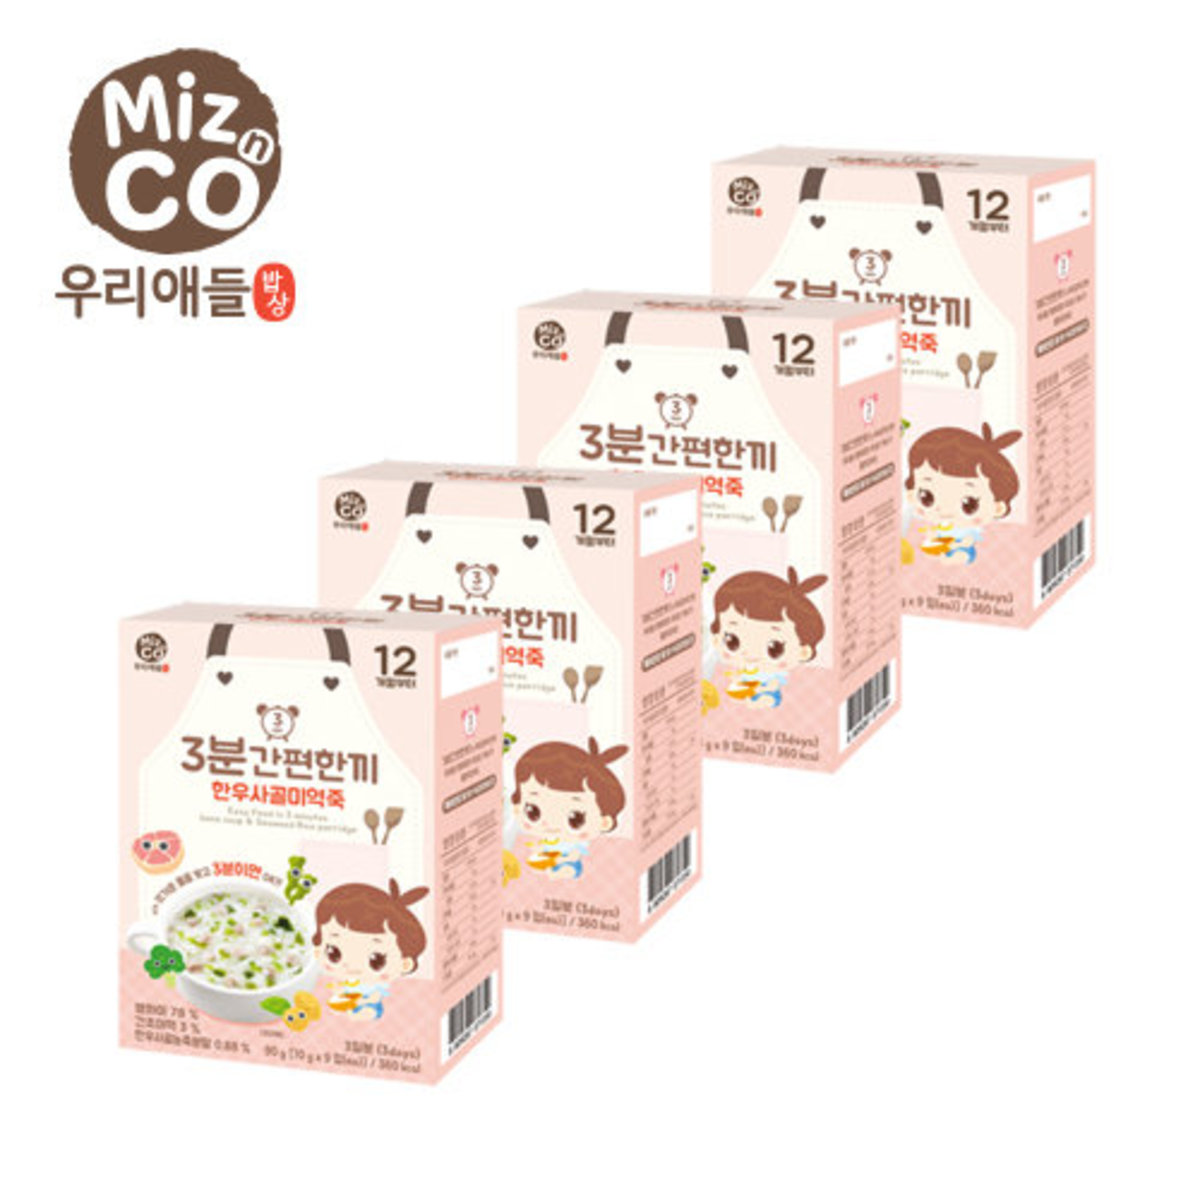 Rice Porridge - Korean Beef Bone Soup & Seaweed (+12 M) - 4 Packs